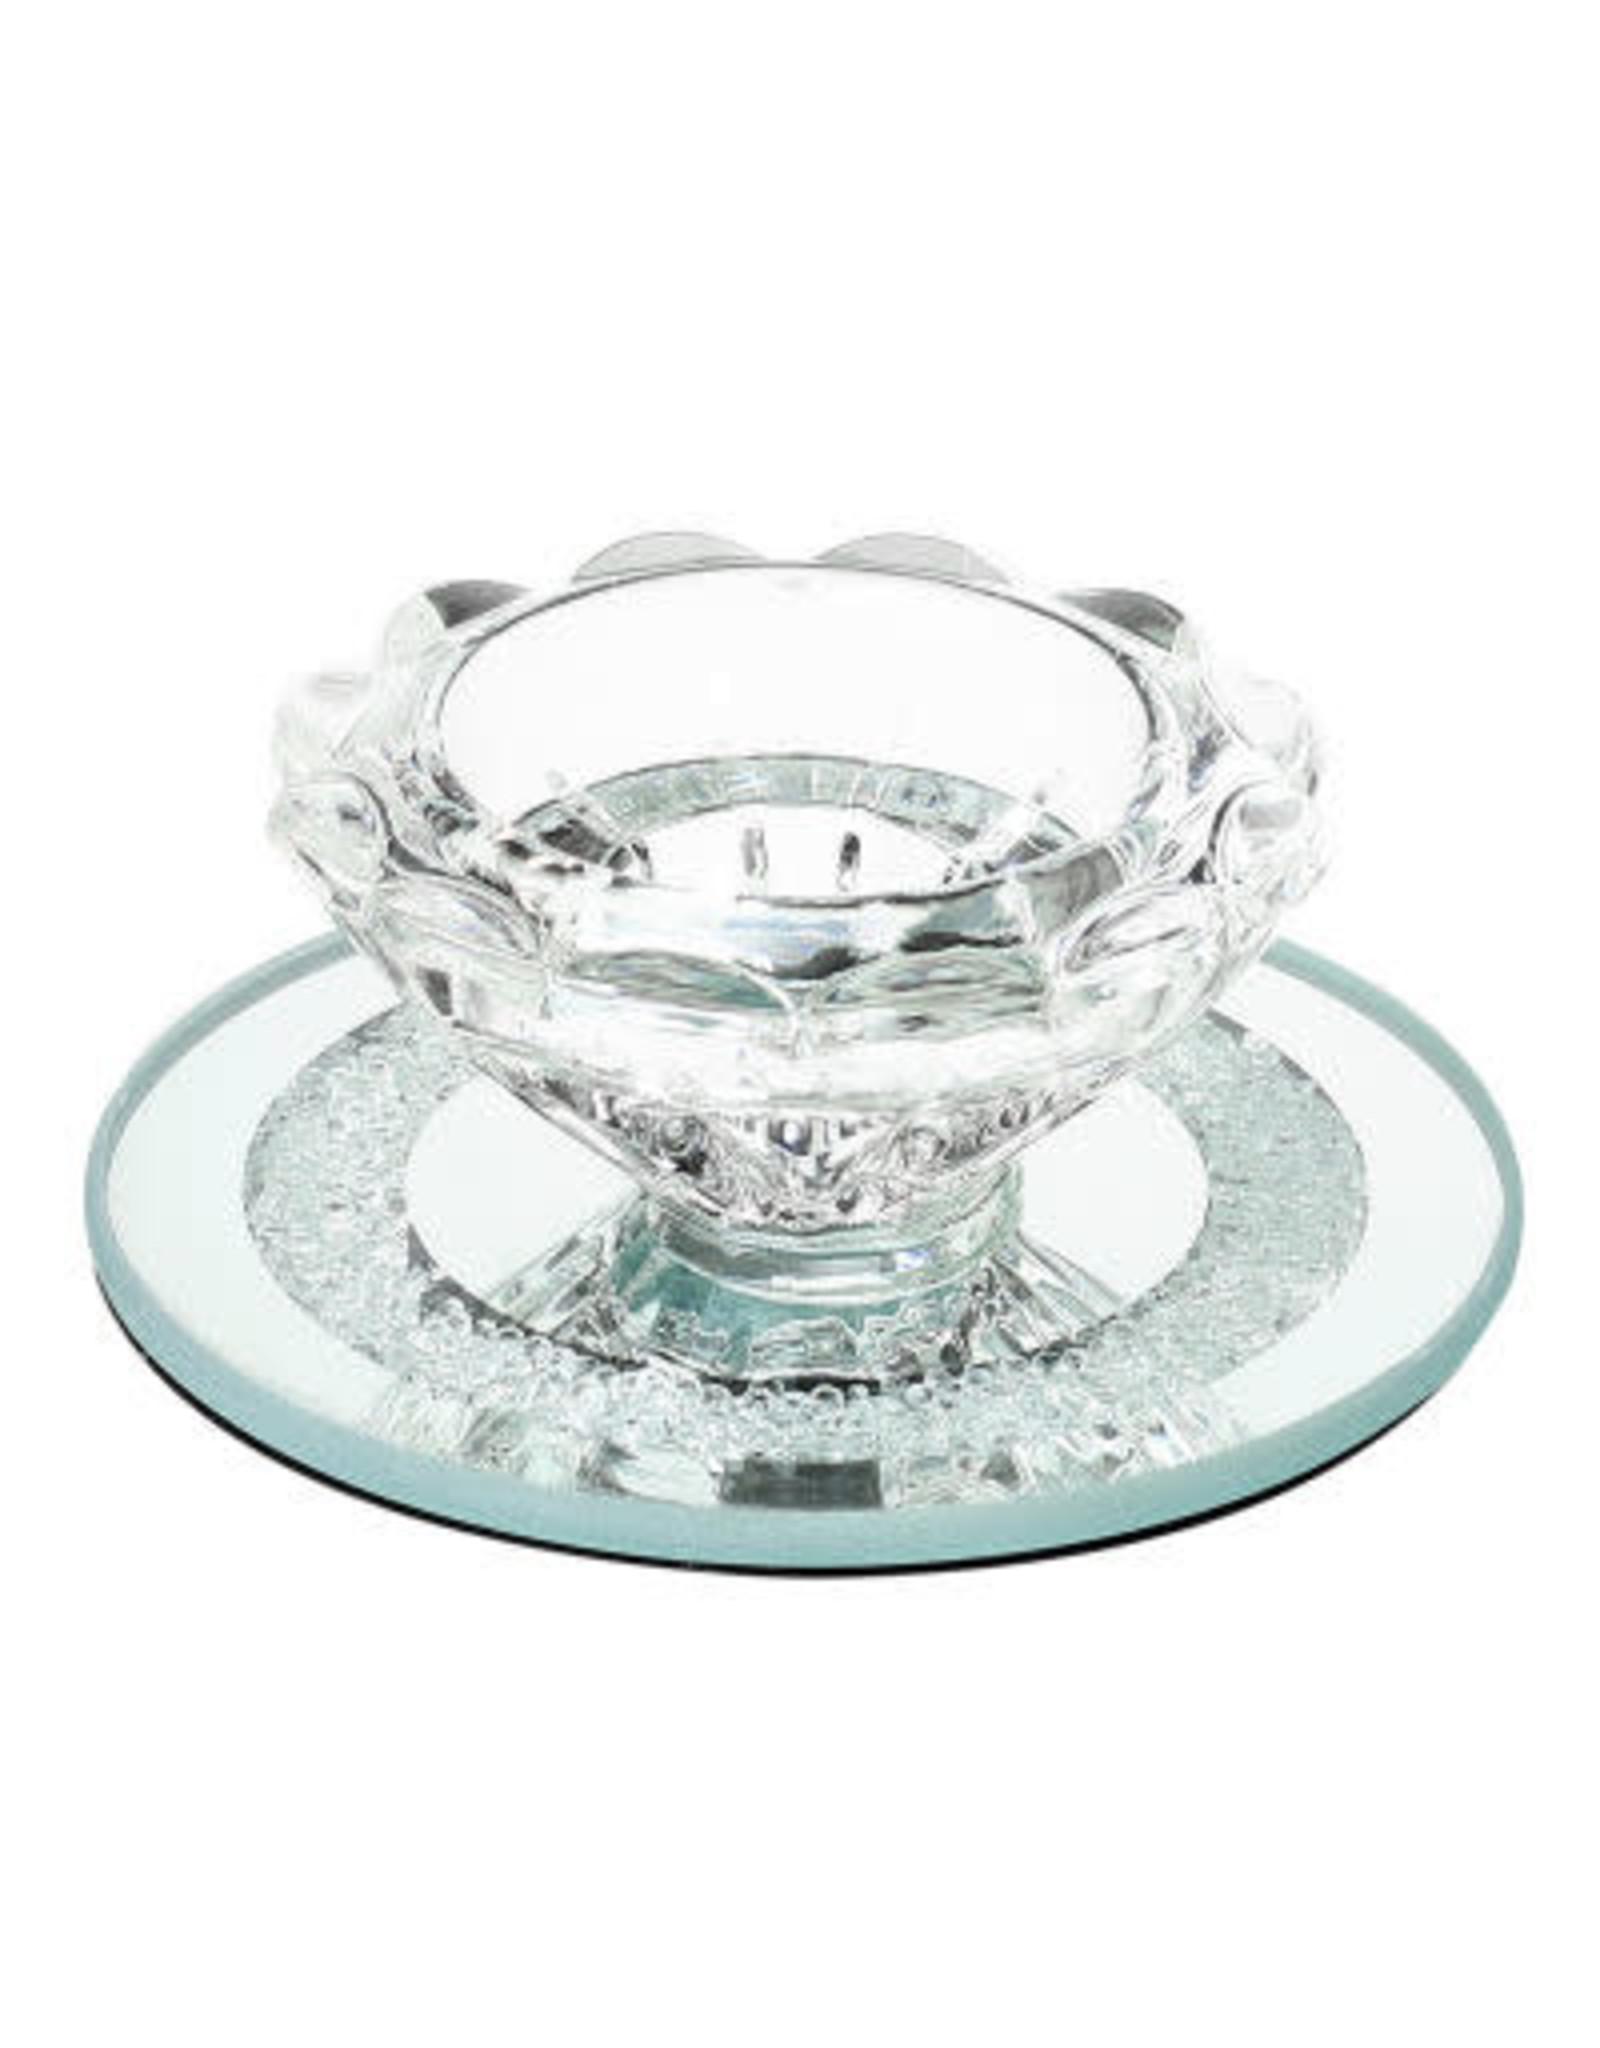 Crystal Candle Holder w. Glass Base , Round Base 3.5